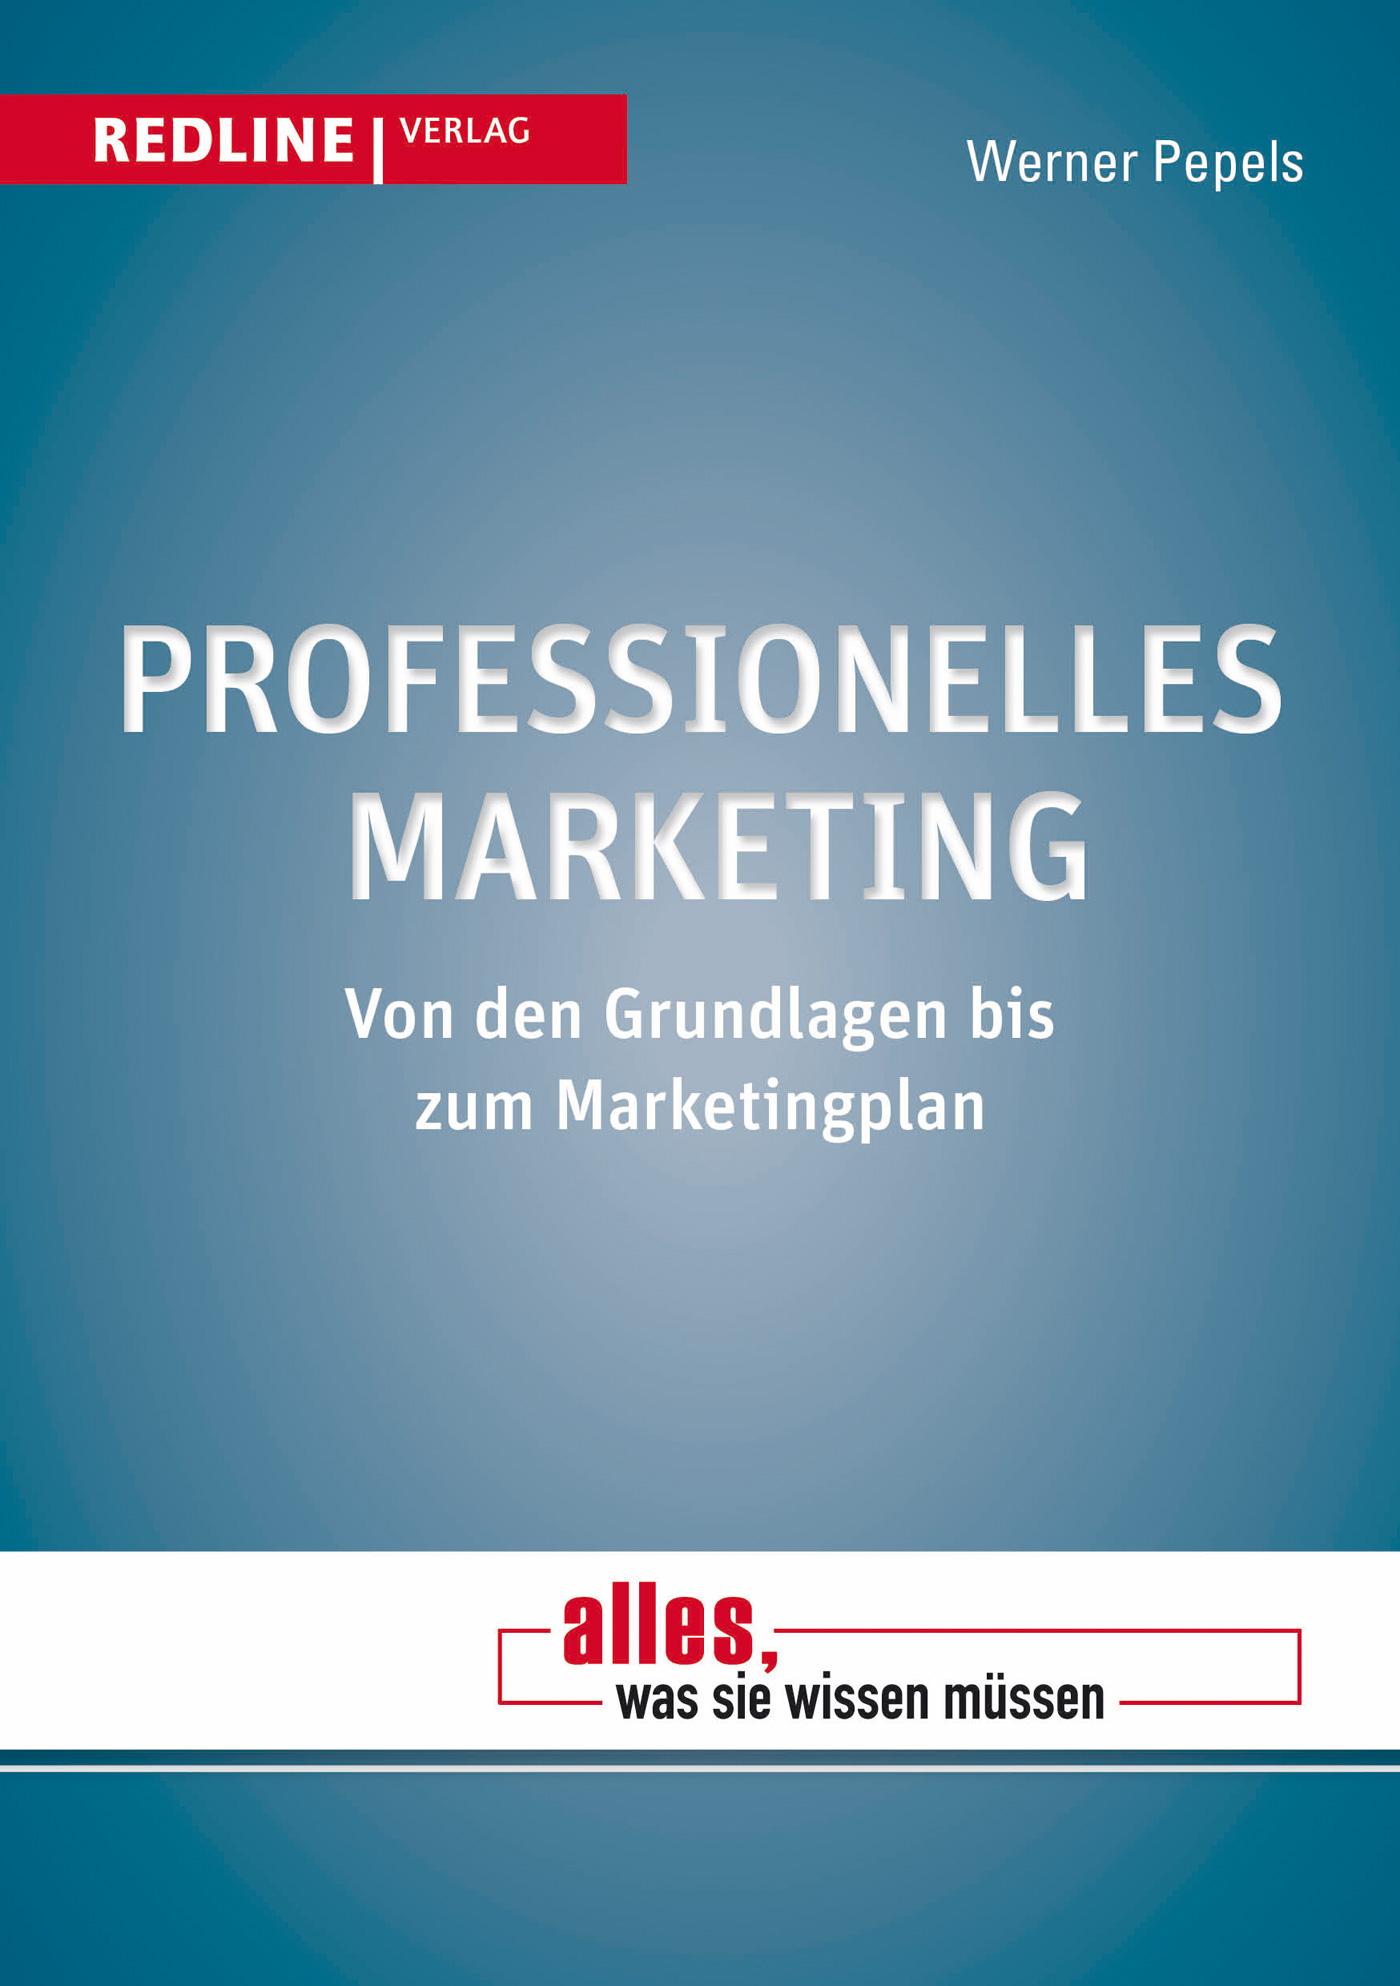 Professionelles Marketing Werner Pepels